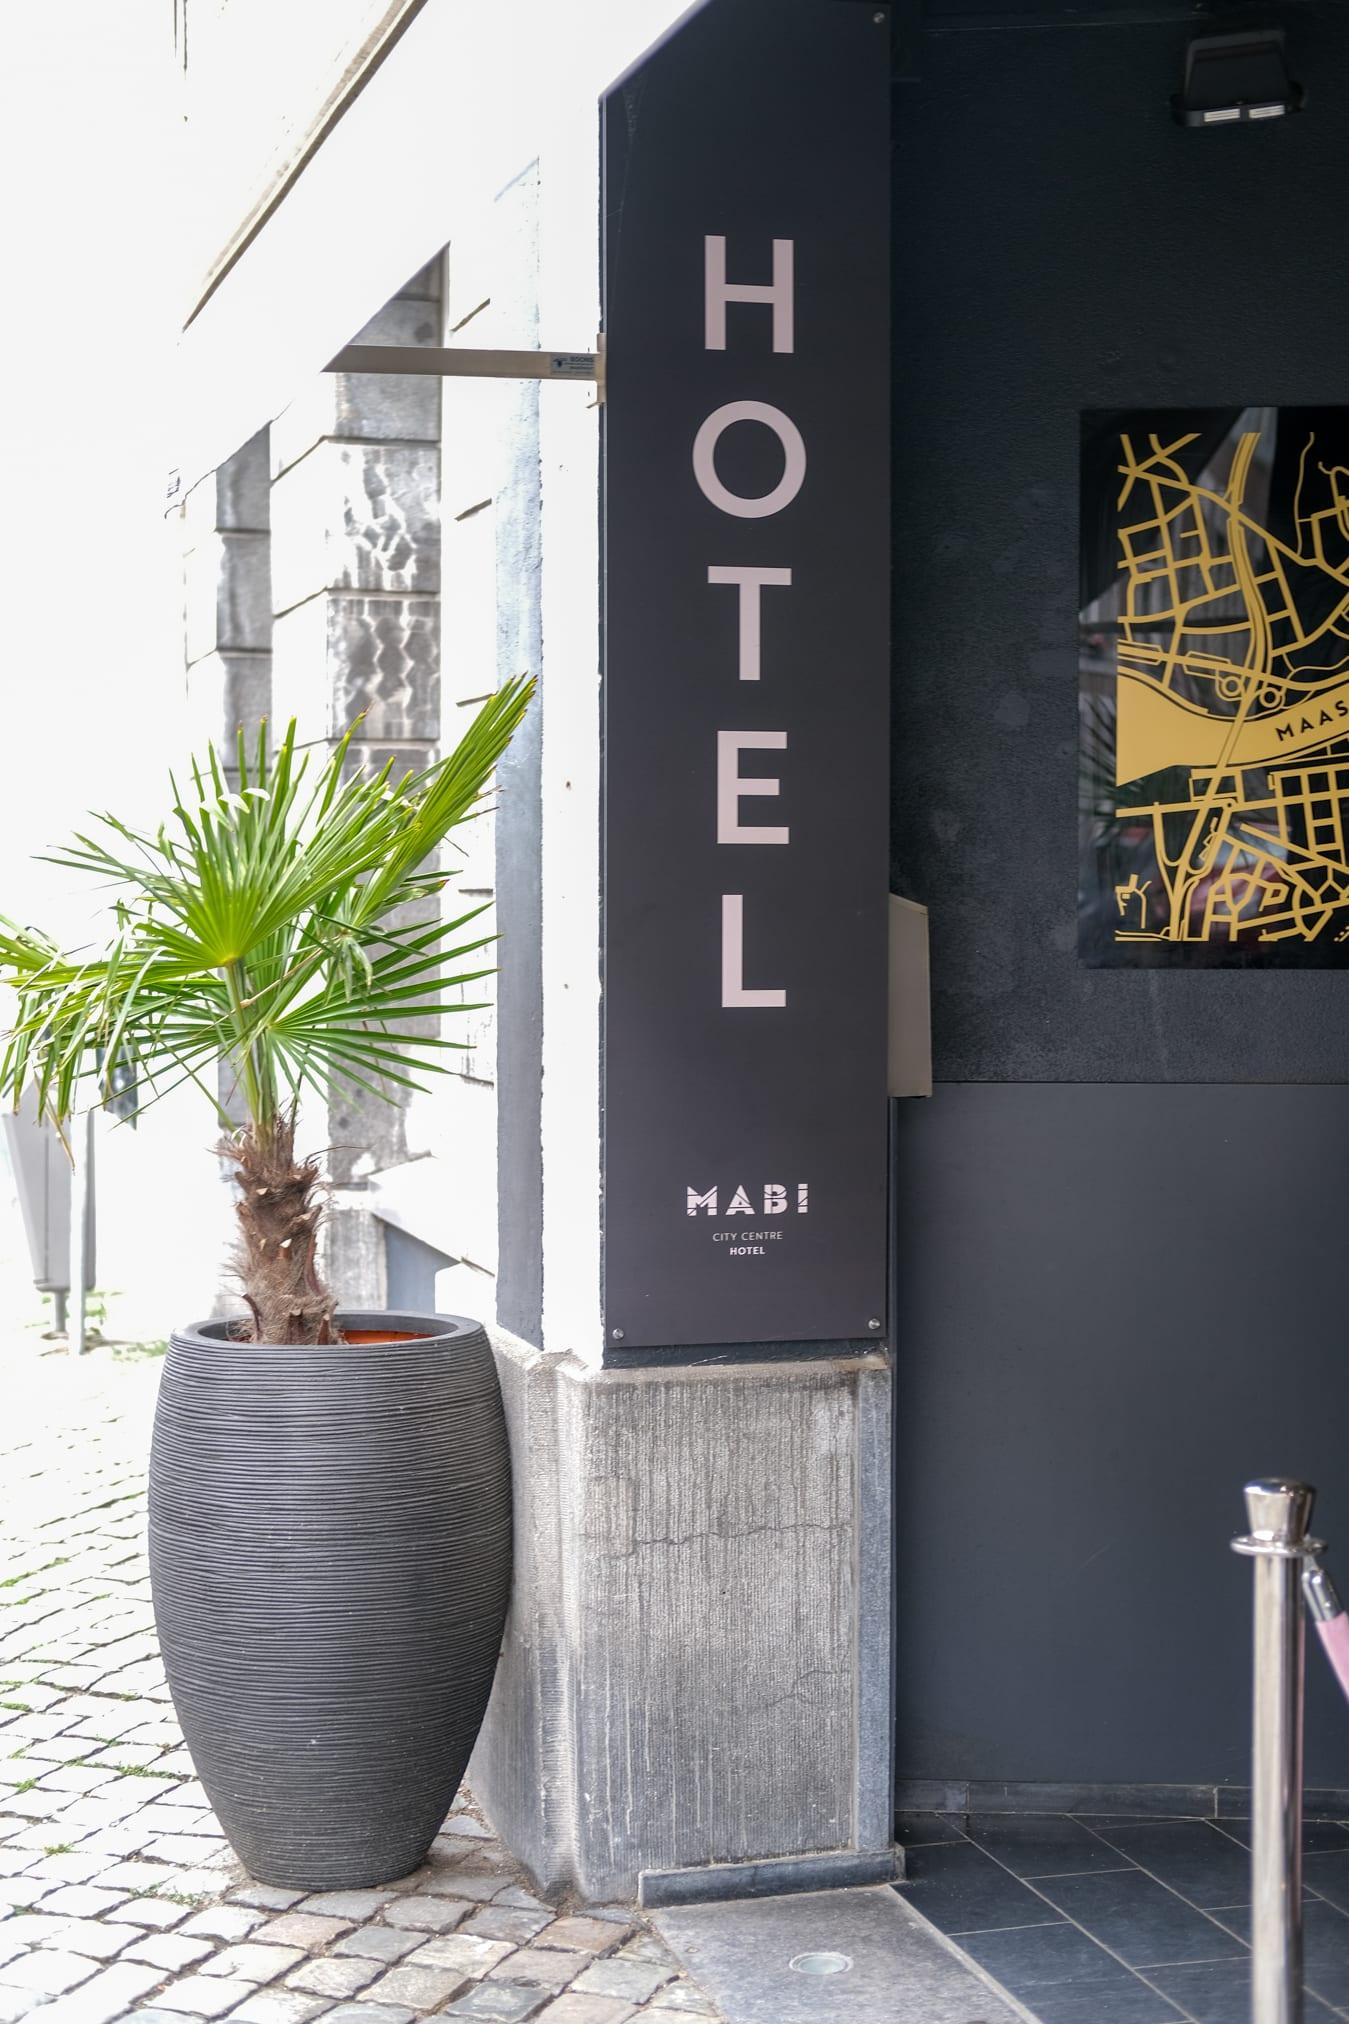 Instagrammable hotel mabi maastricht